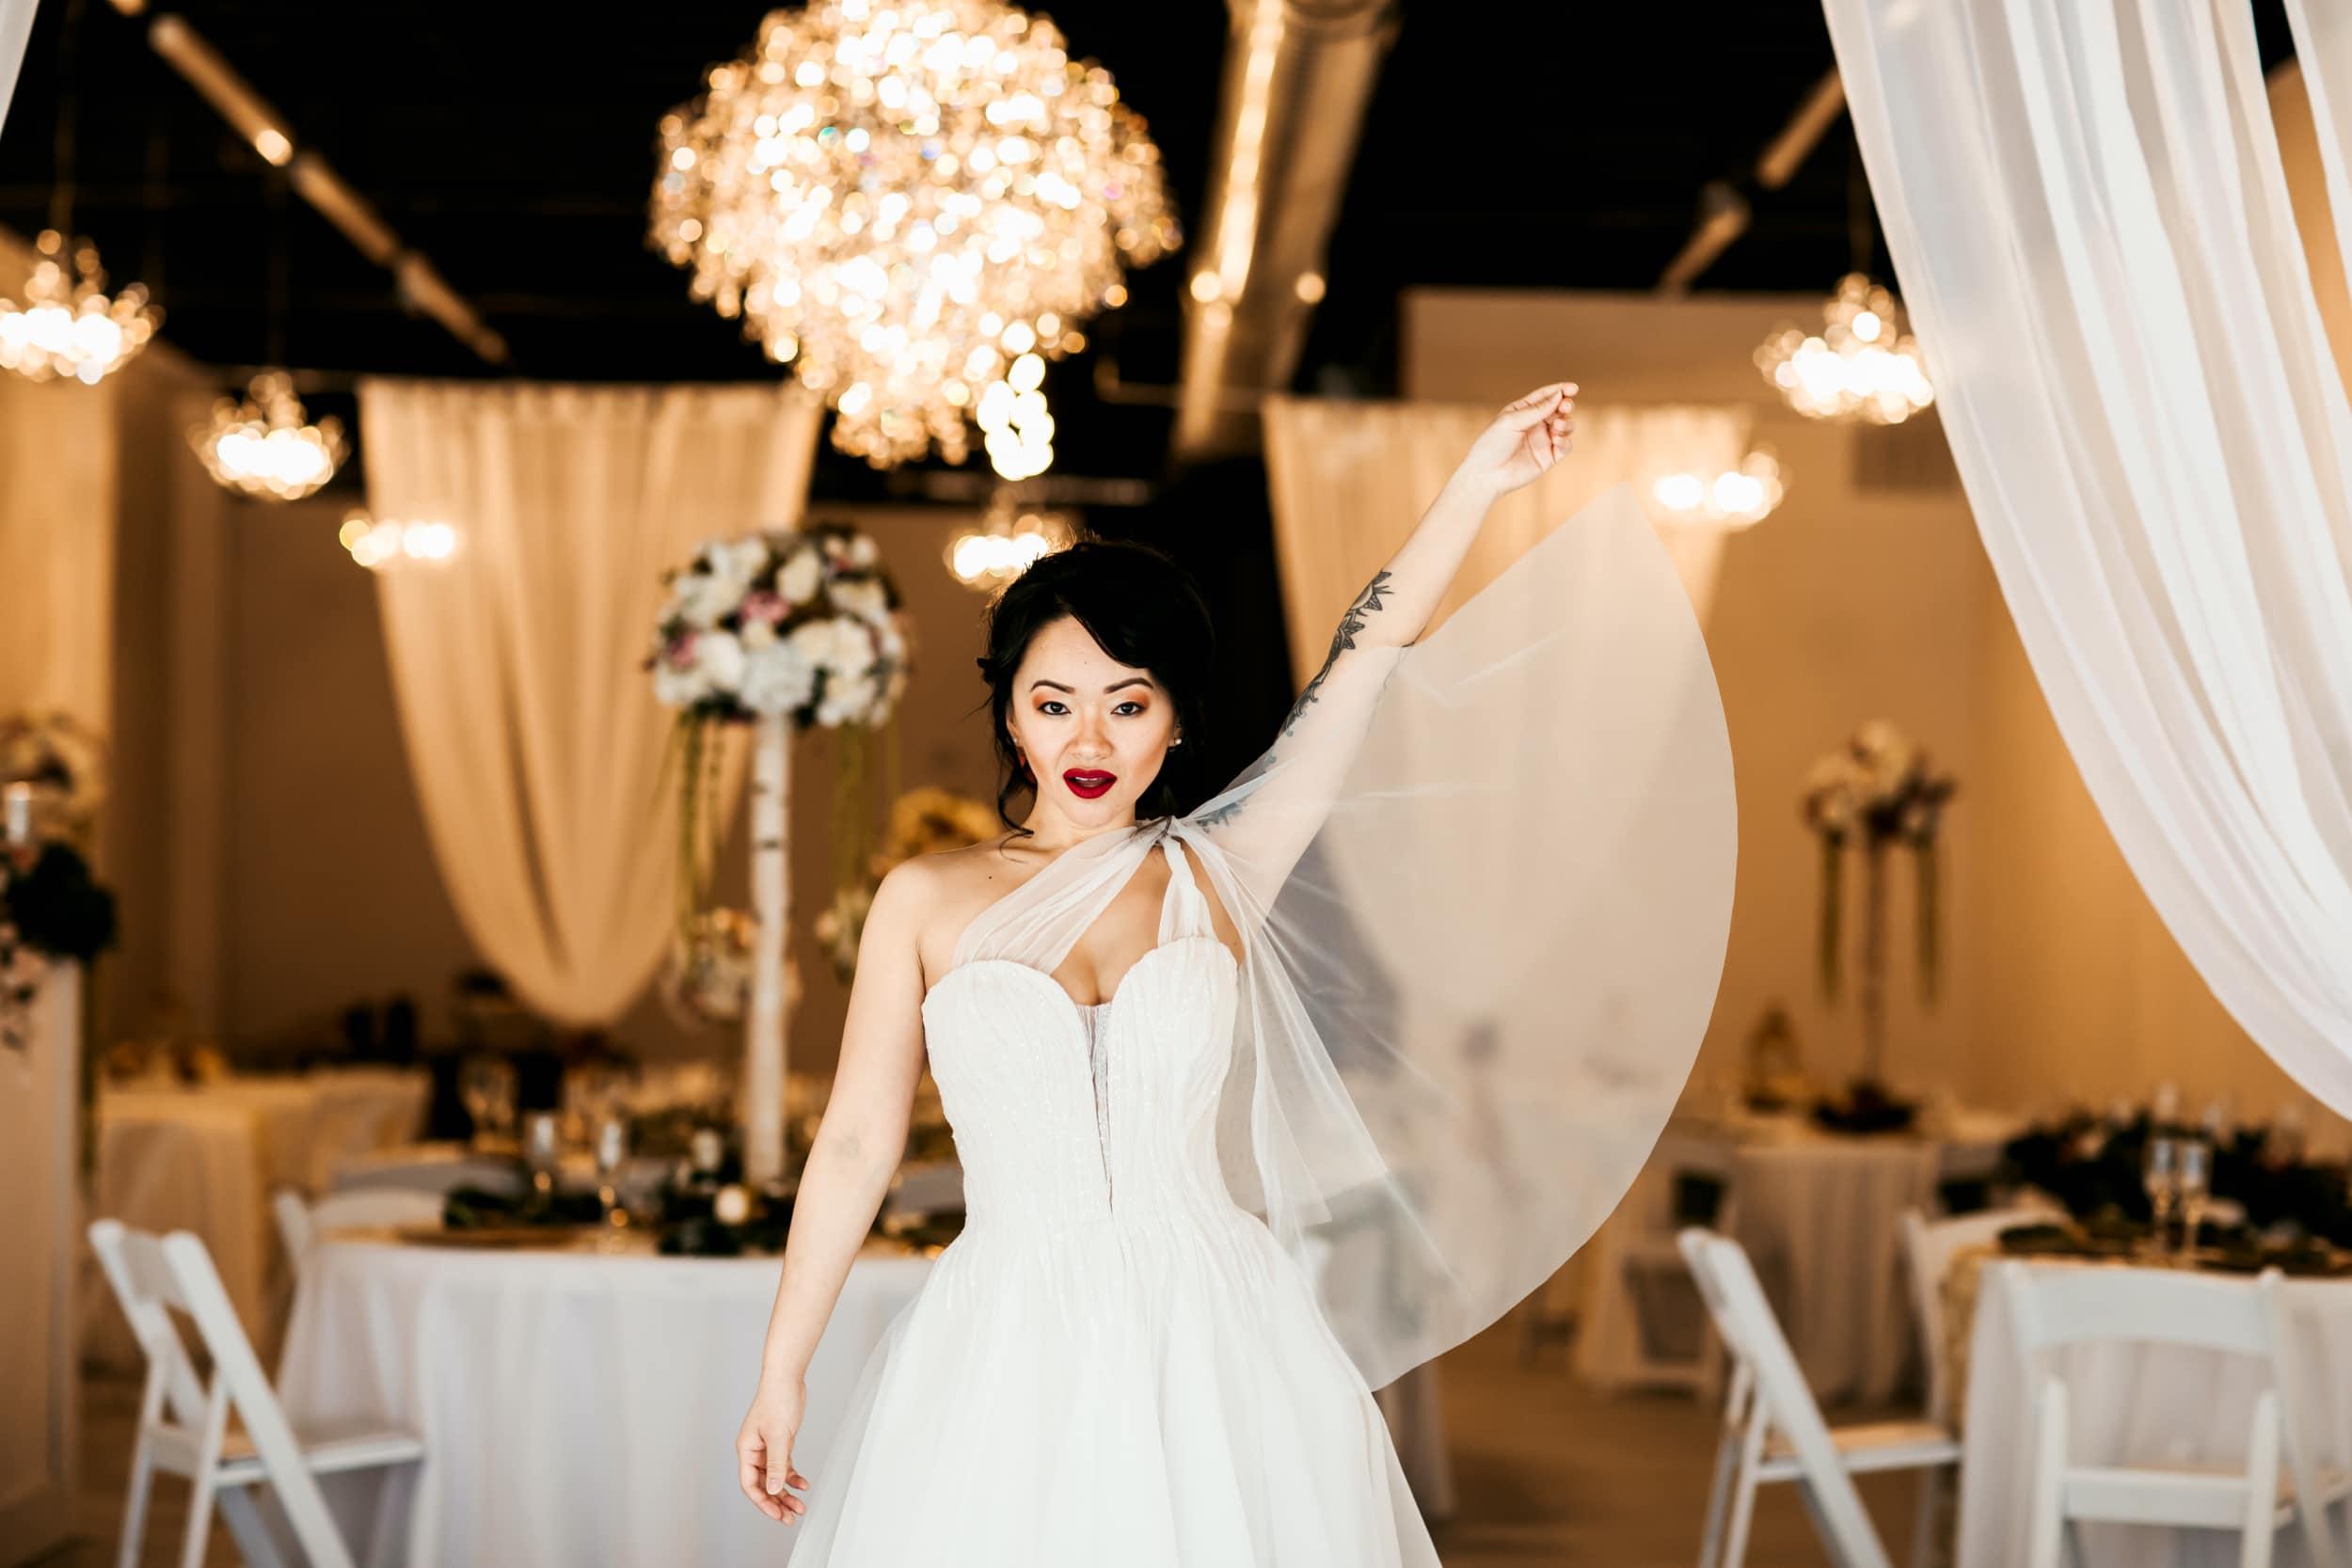 Milwaukee wedding photography-Kat Wegrzyniak-Double You Photography